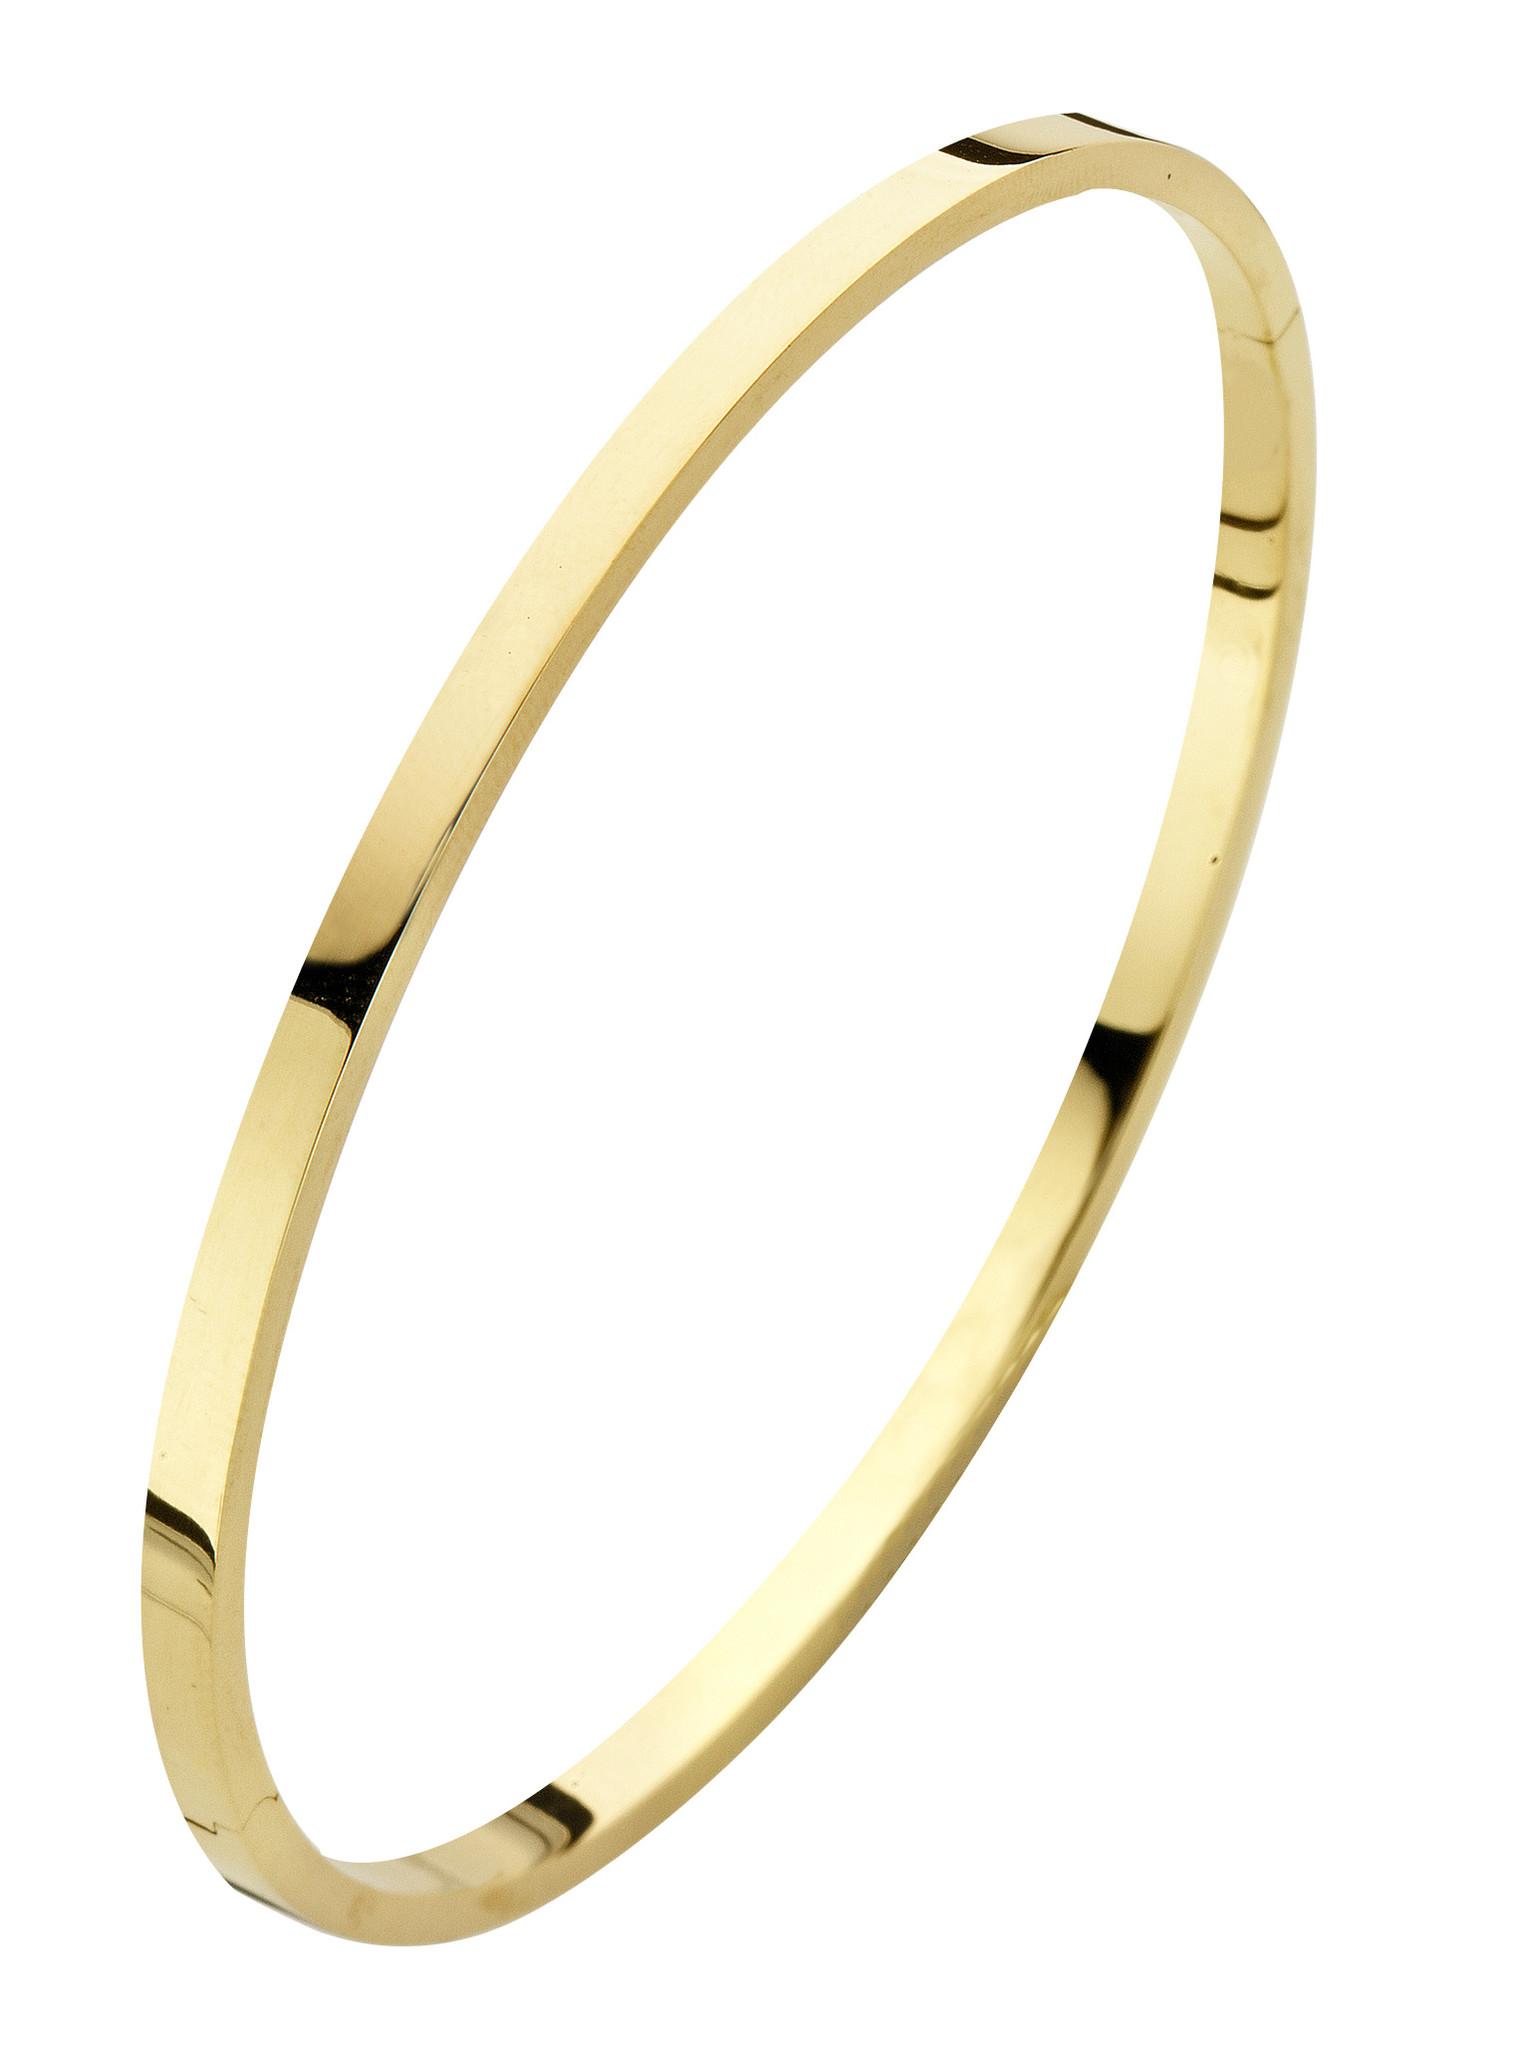 14 karaat geelgouden armband - Recht 3 mm - Fjory - Slavenarmband-1